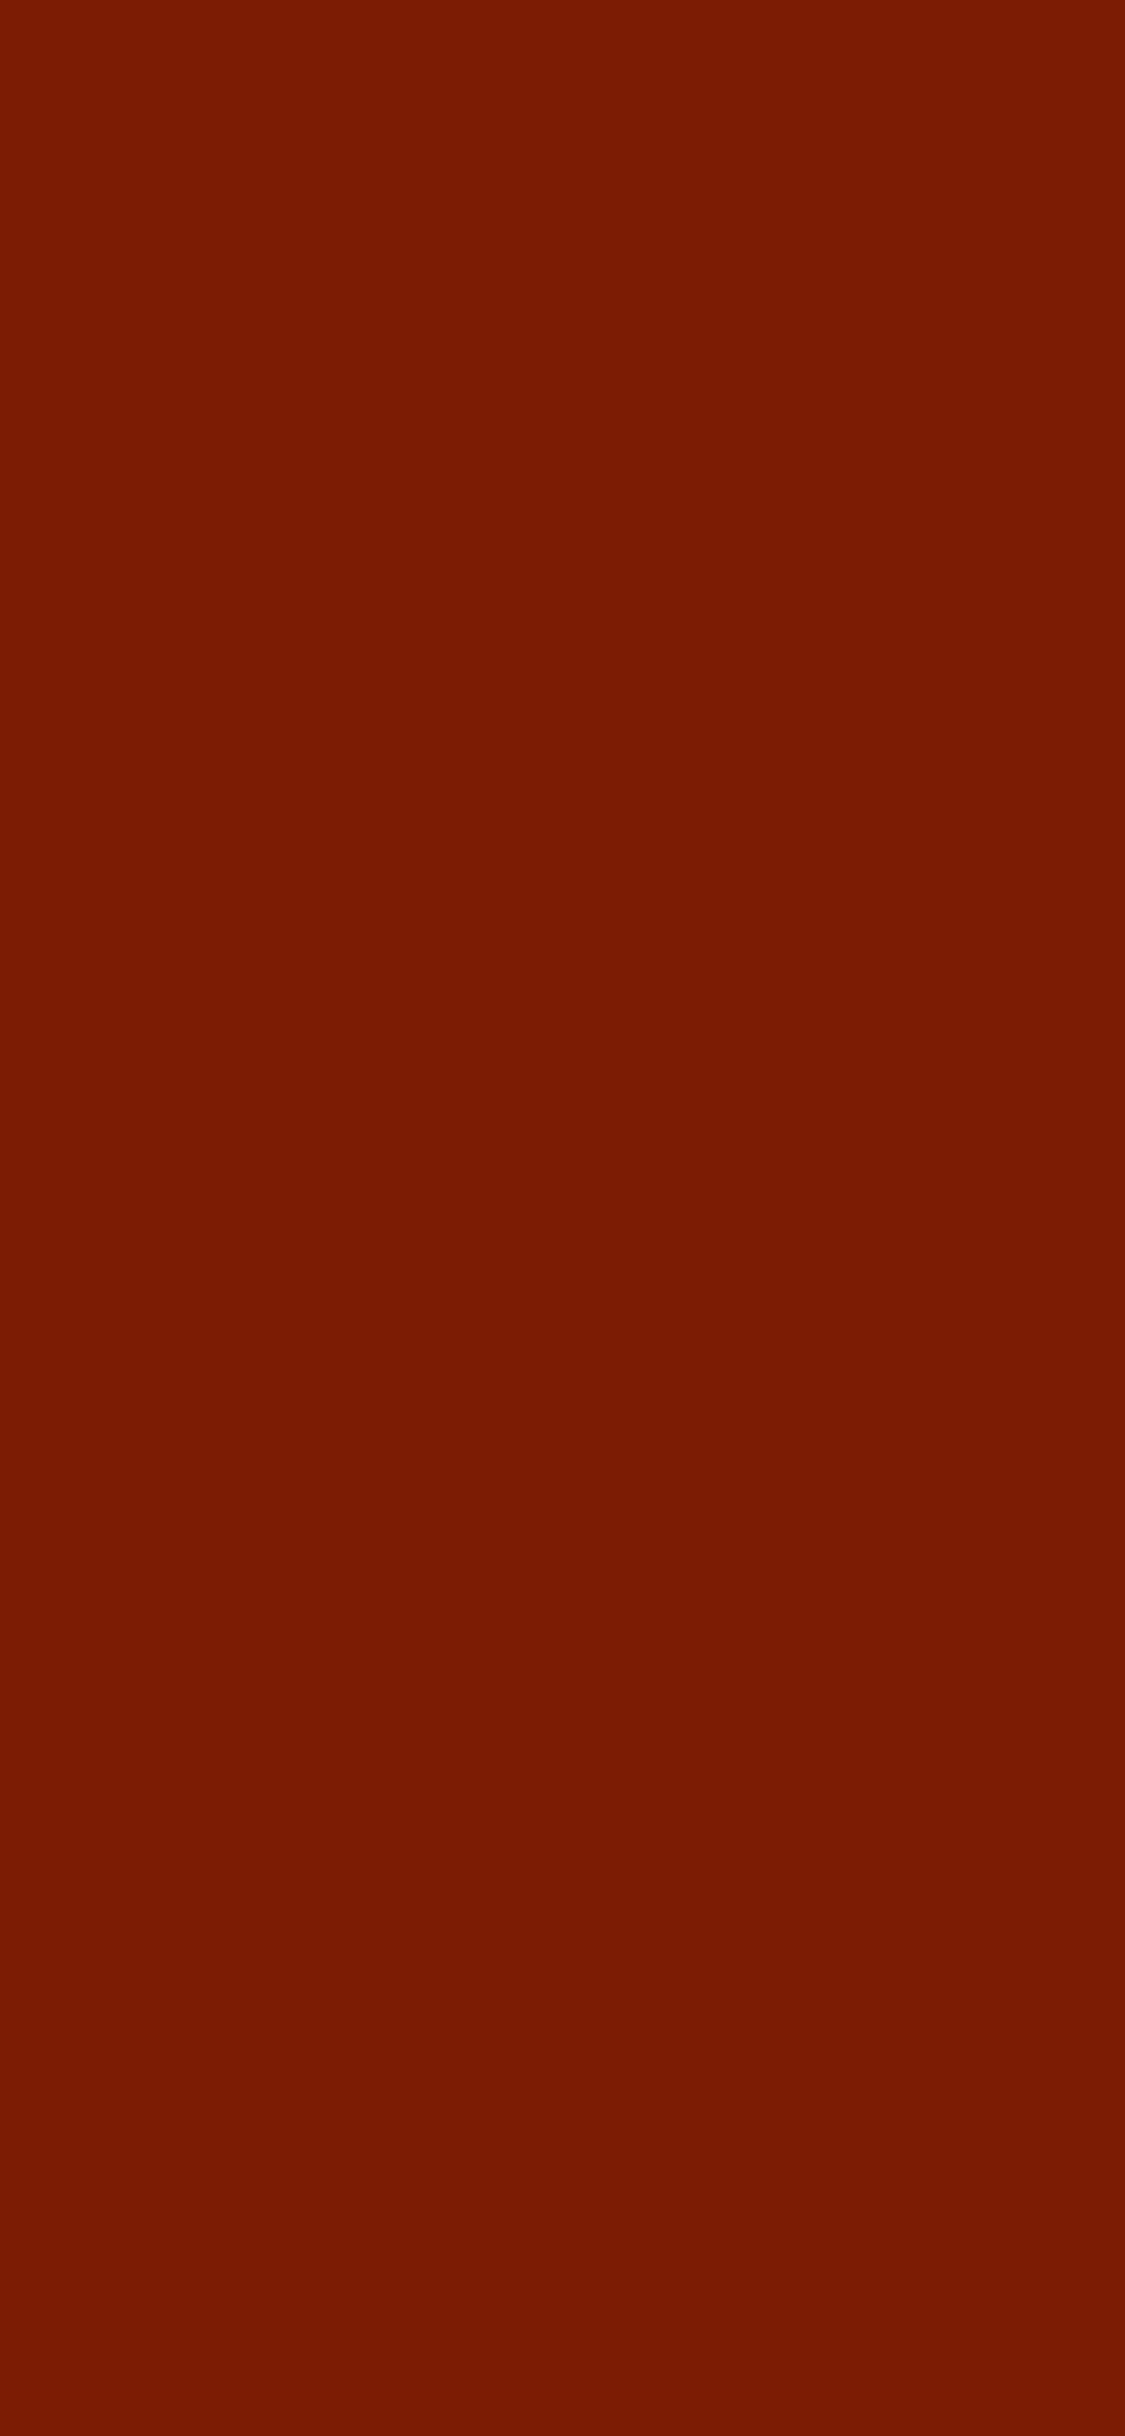 1125x2436 Kenyan Copper Solid Color Background